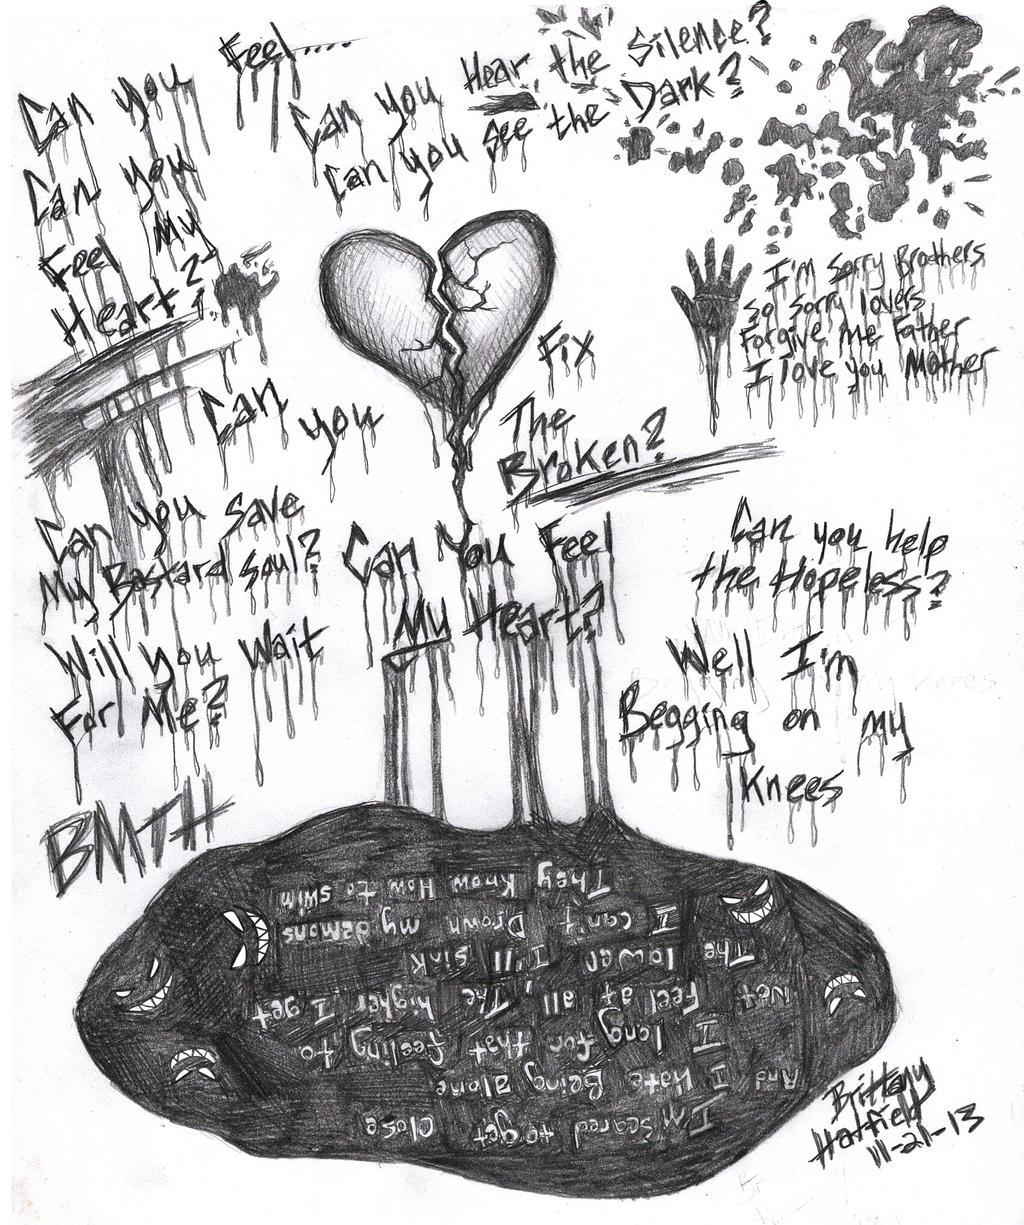 BMTH Can You Feel My Heart By DarkAngel2008 On DeviantArt